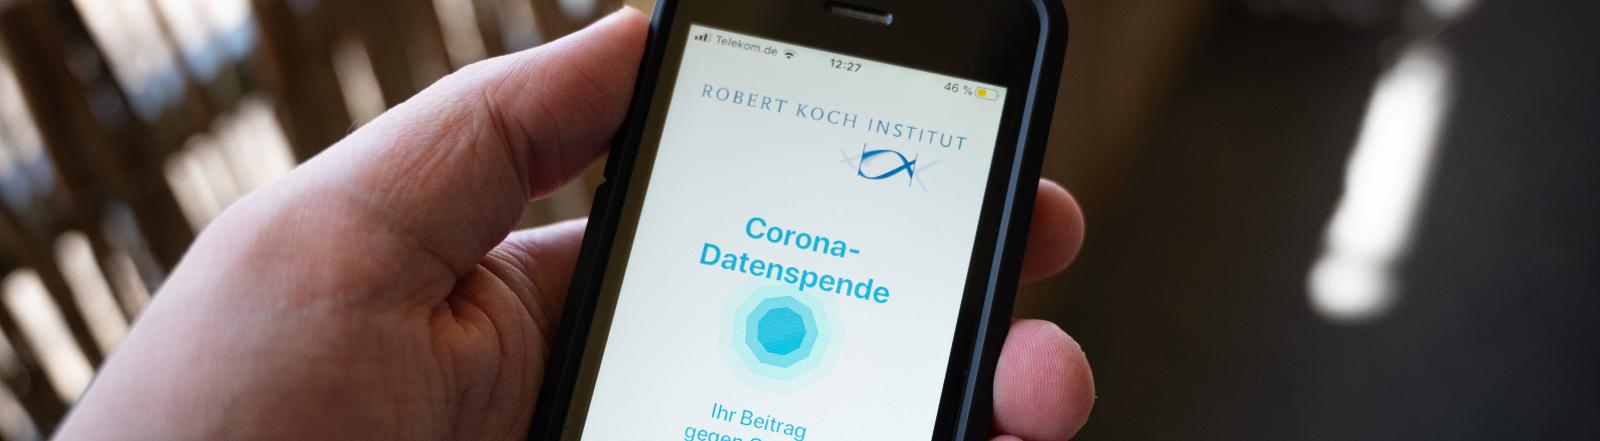 Nutzer der Datenspende-App des RKI